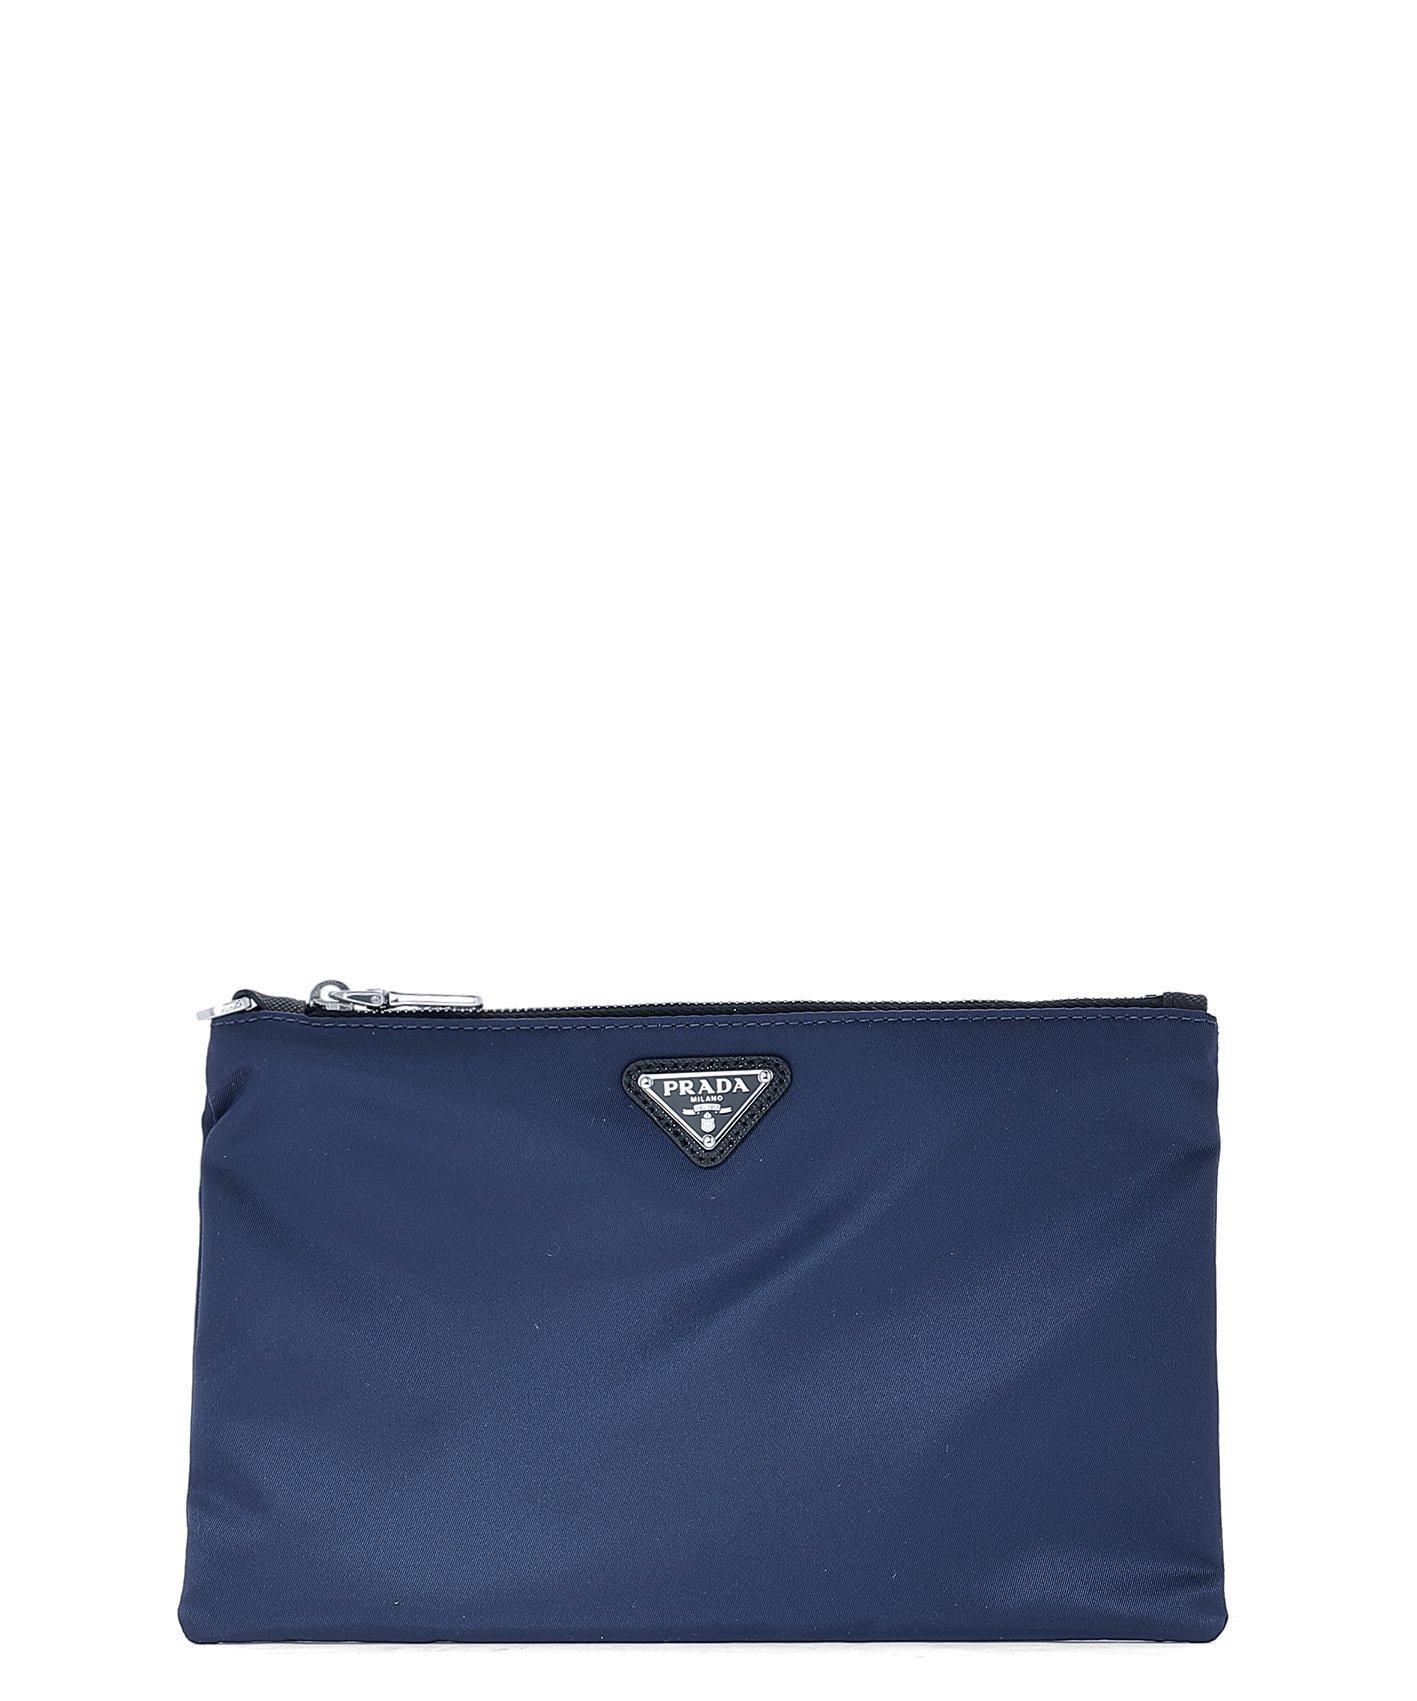 38b141287d81 Lyst - Prada Logo Pouch in Blue for Men